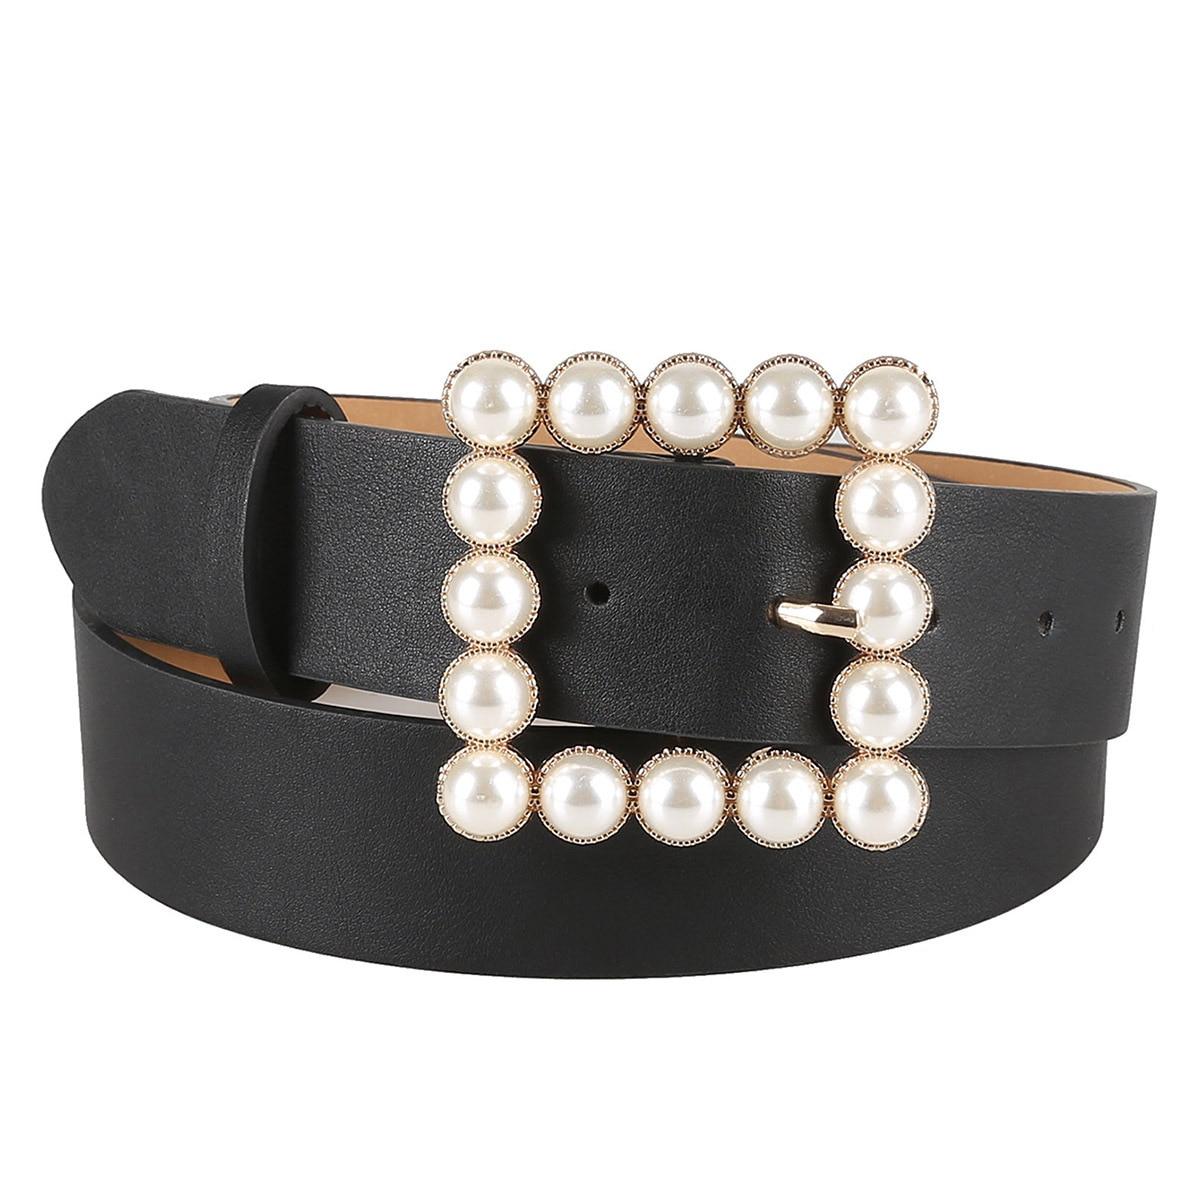 Pearl Buckle Belt For Women Luxury Diamond PU Leather Strap Jeans Decorative Belt Party Harajuku Designer Belts For Women's